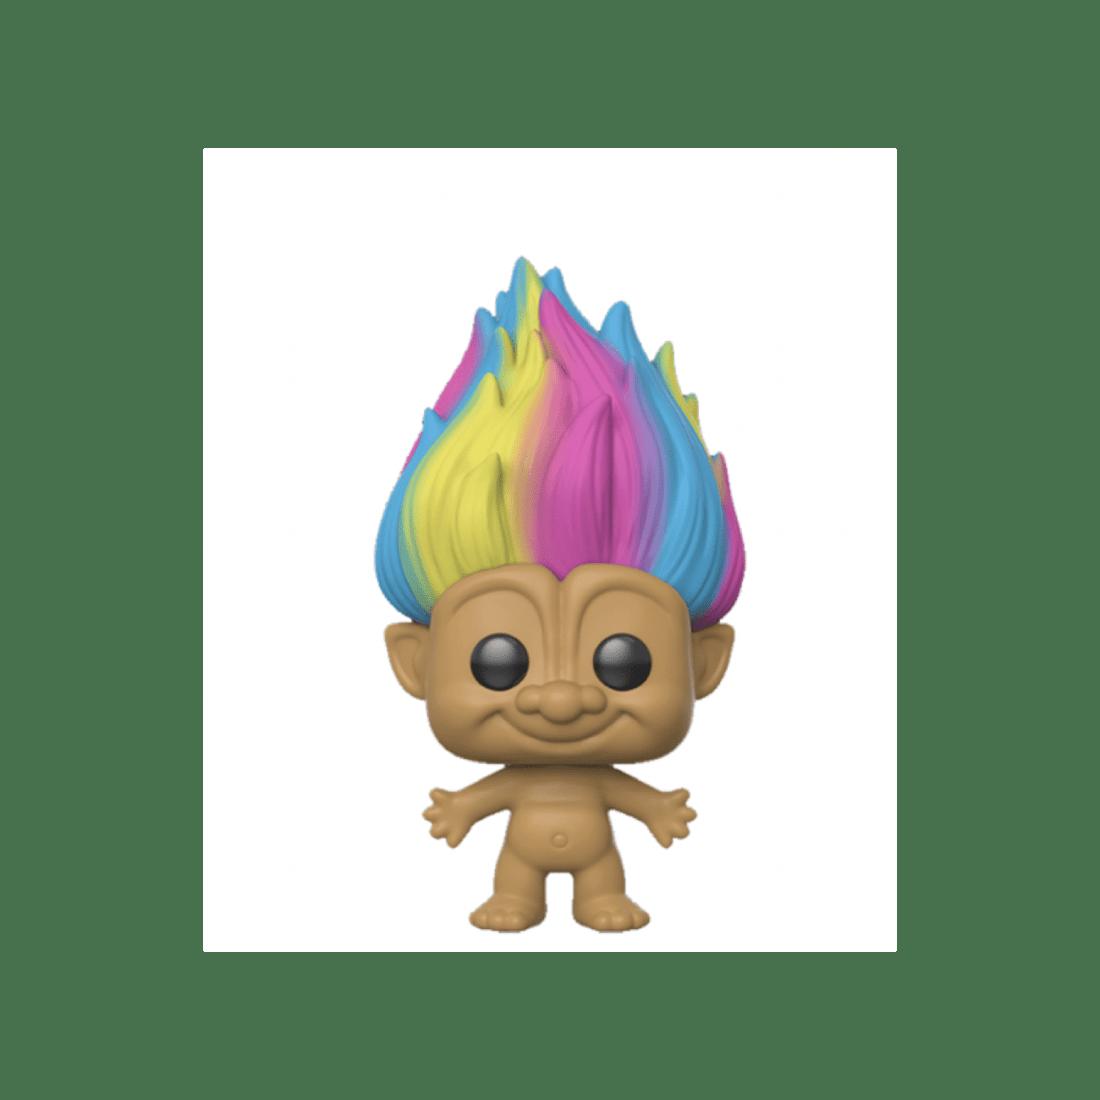 44604POPTrolls-RainbowTroll_NOTFINAL_WEB.png